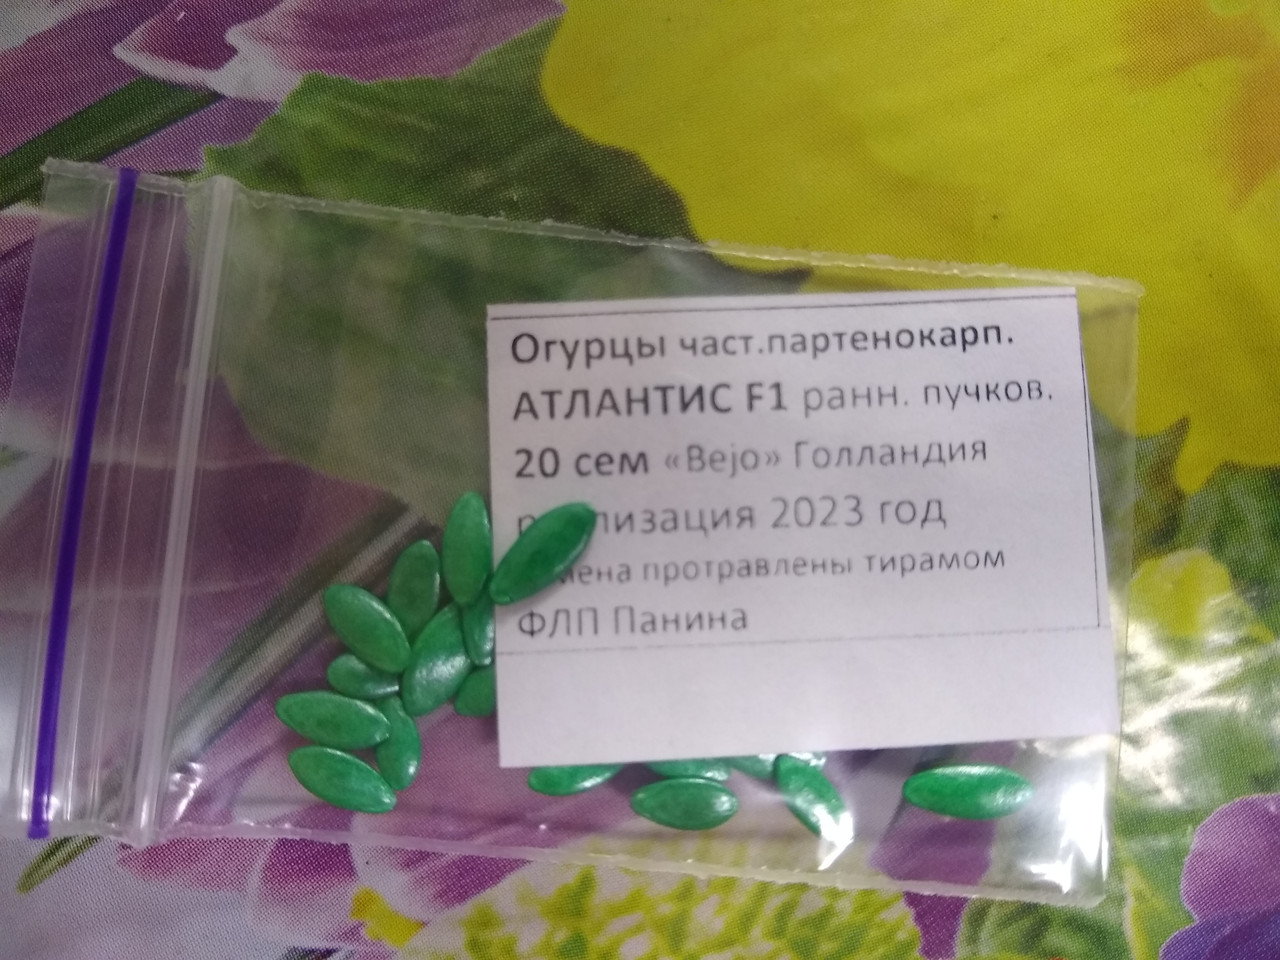 Семена огурца Атлантис F1 ранний гибрид  пучковой 20 семян Bejo Голландия